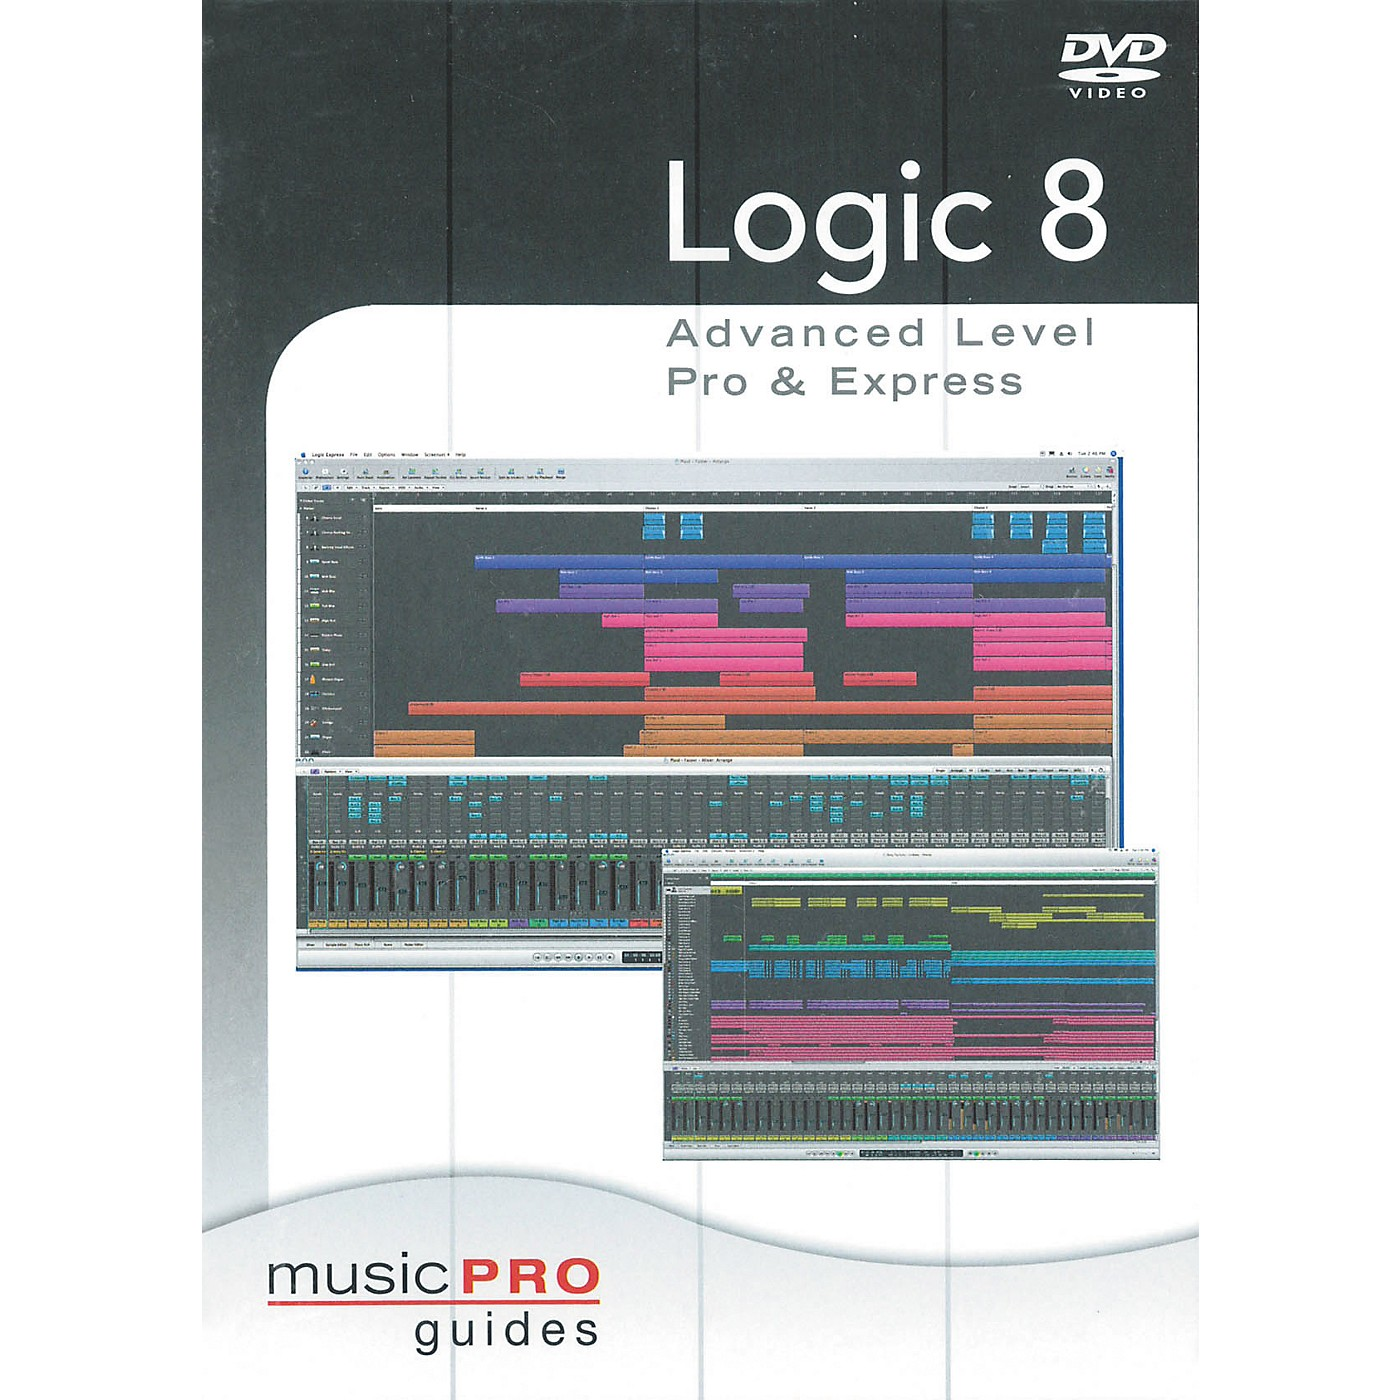 Hal Leonard Logic 8 Advanced Level Pro & Express - Music Pro Series (DVD) thumbnail